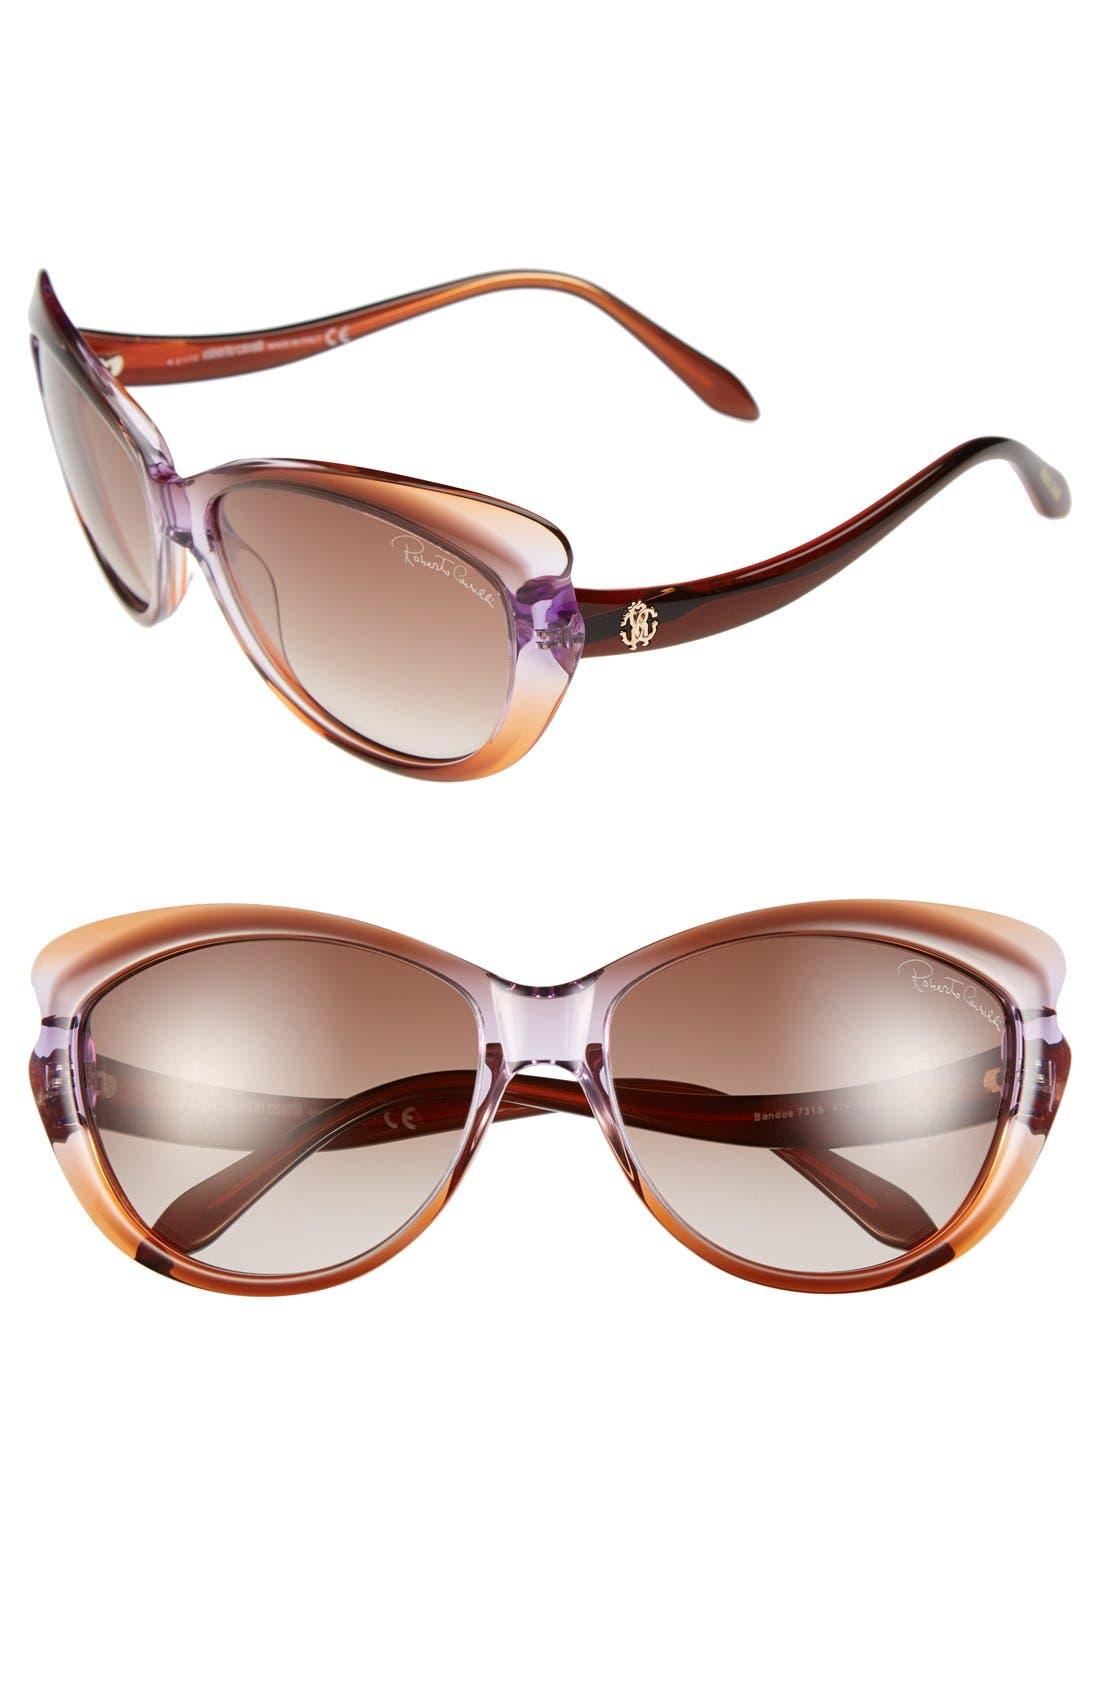 Main Image - Roberto Cavalli 59mm Sunglasses